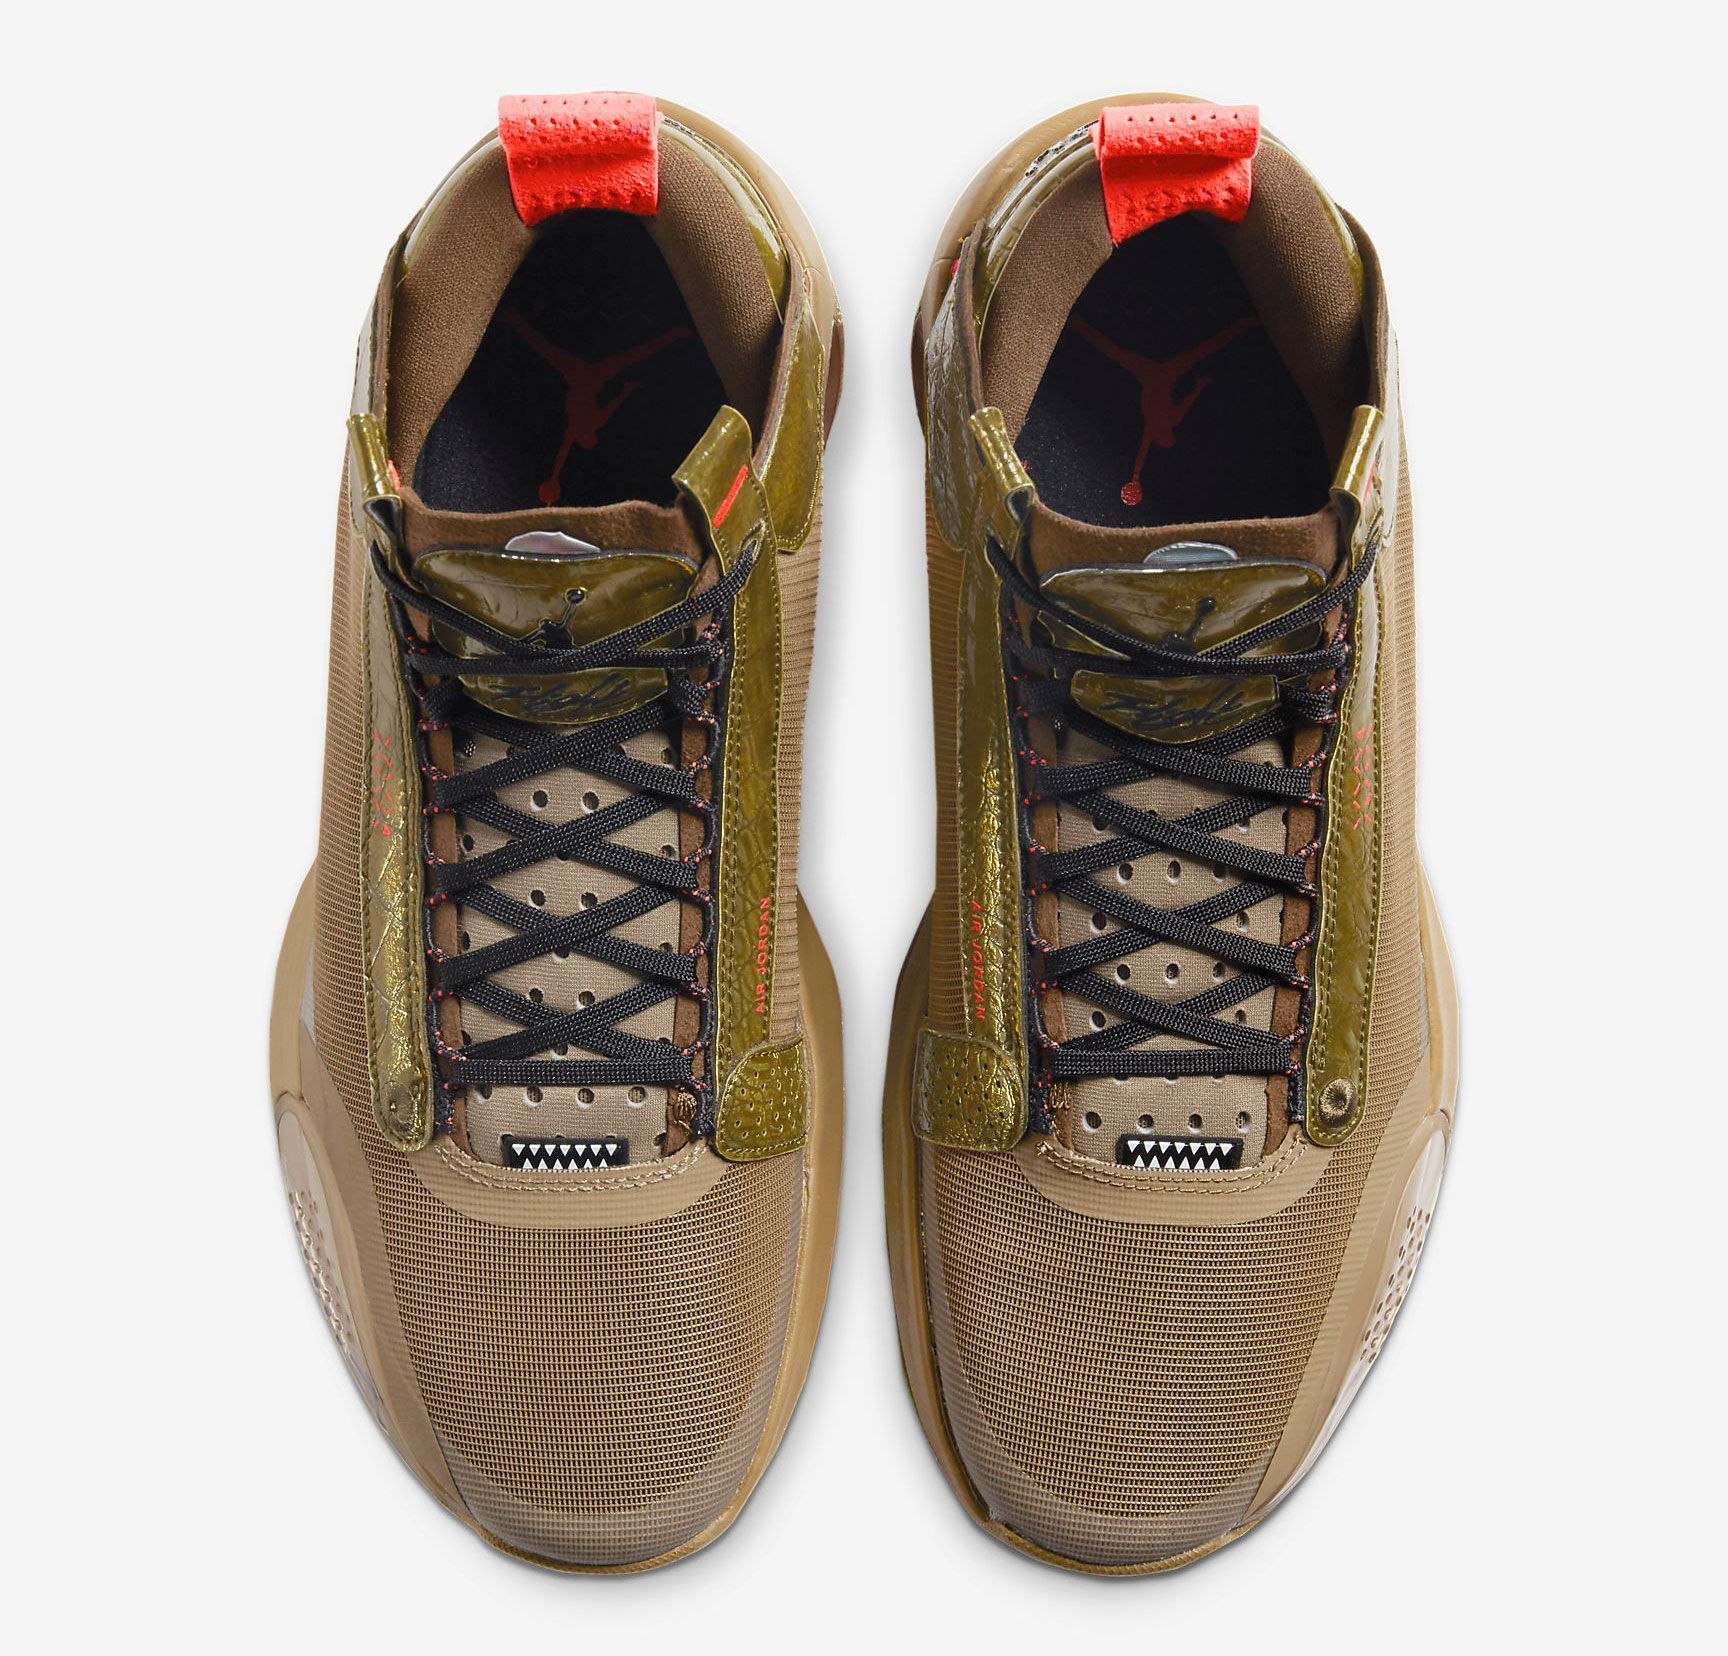 air-jordan-34-bayou-boys-zion-release-date-price-4